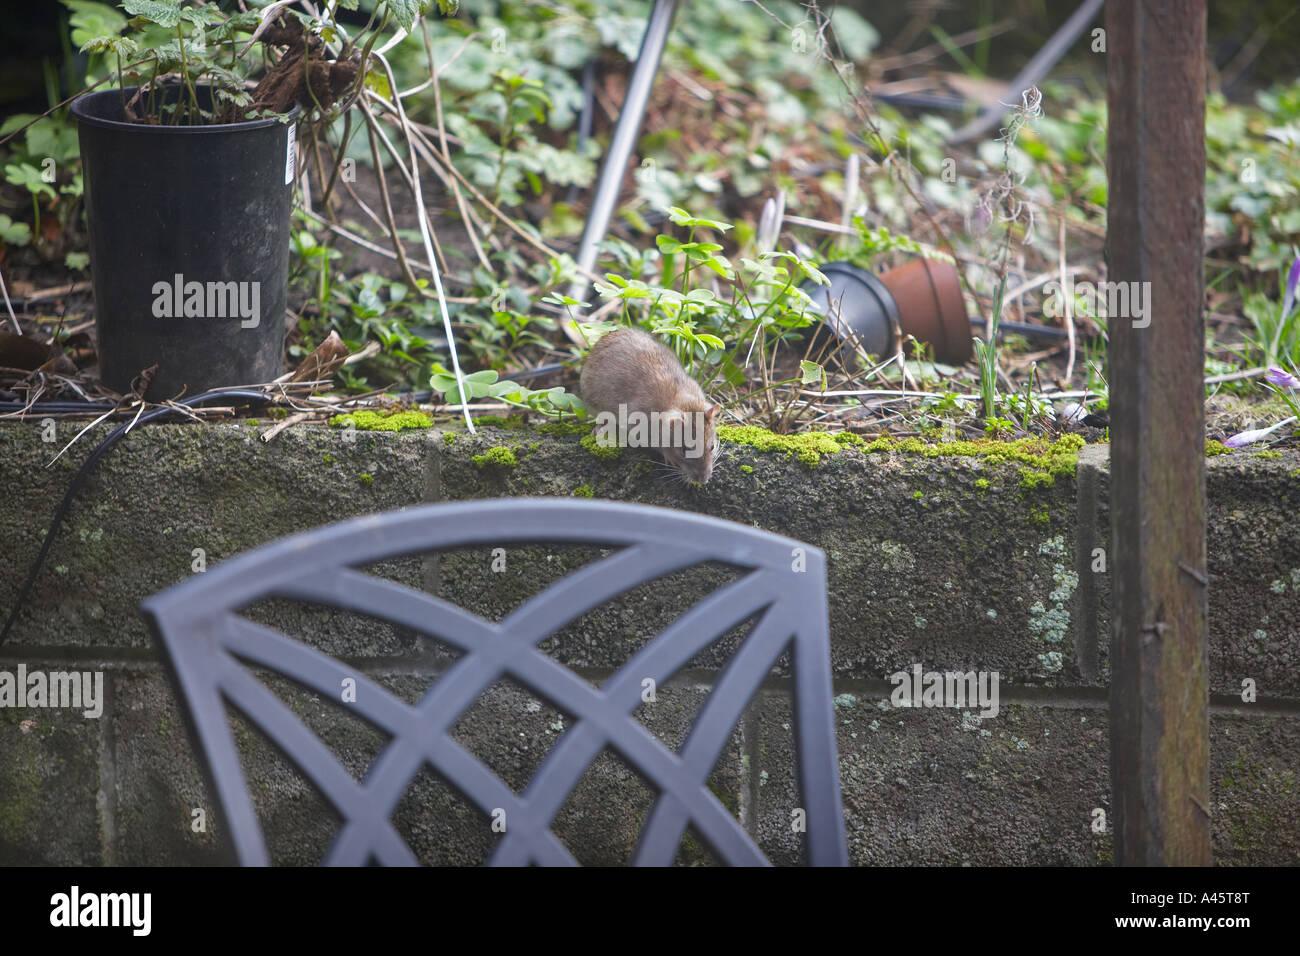 Rat Rattus norvegicus looking for food in a domestic garden - Stock Image